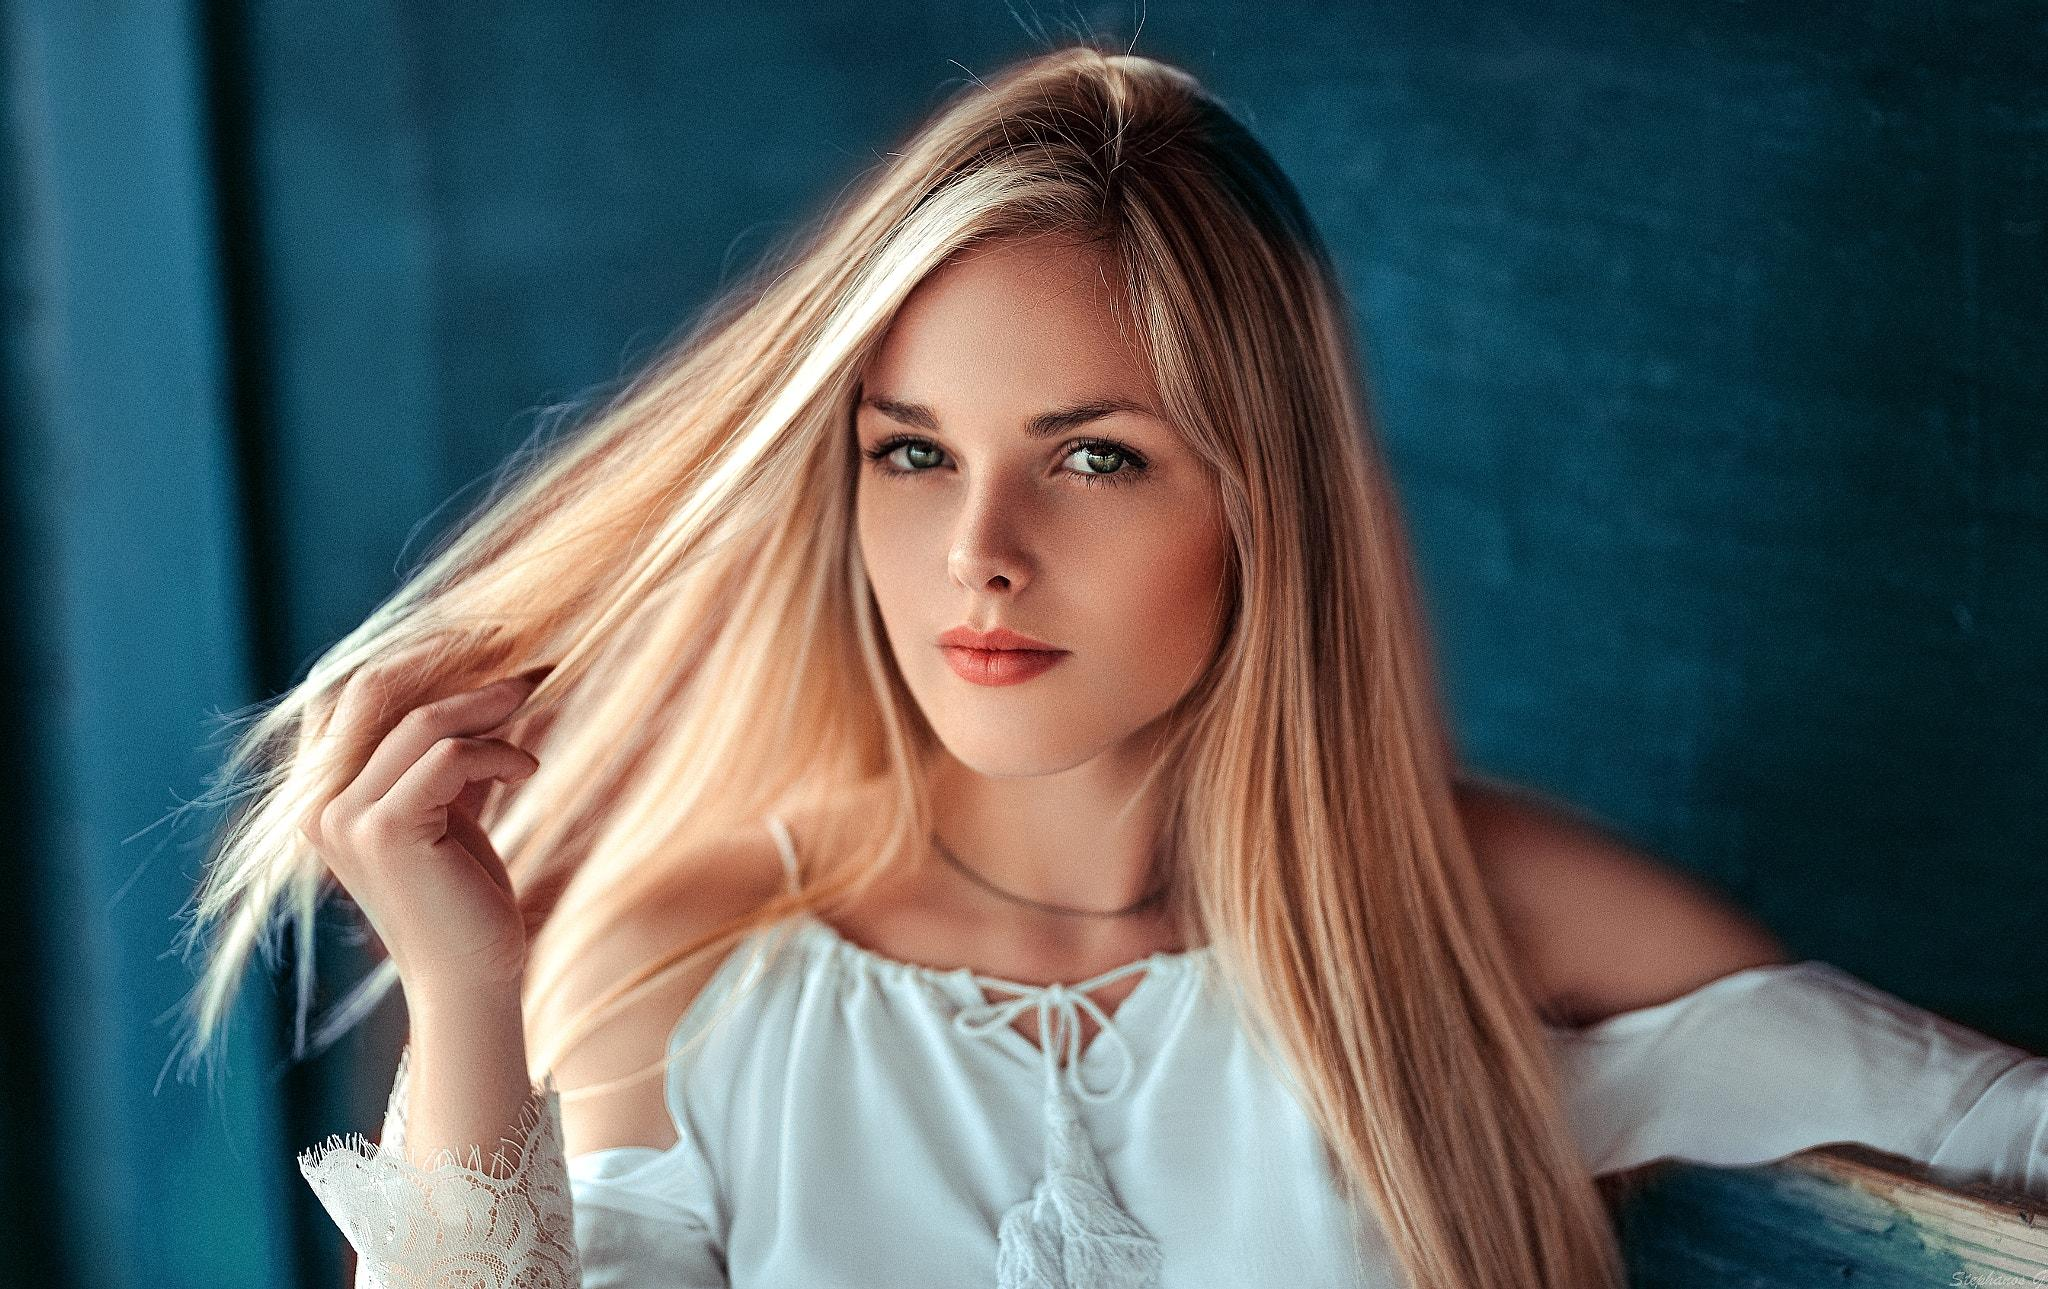 Beautiful Blondes Wallpaper